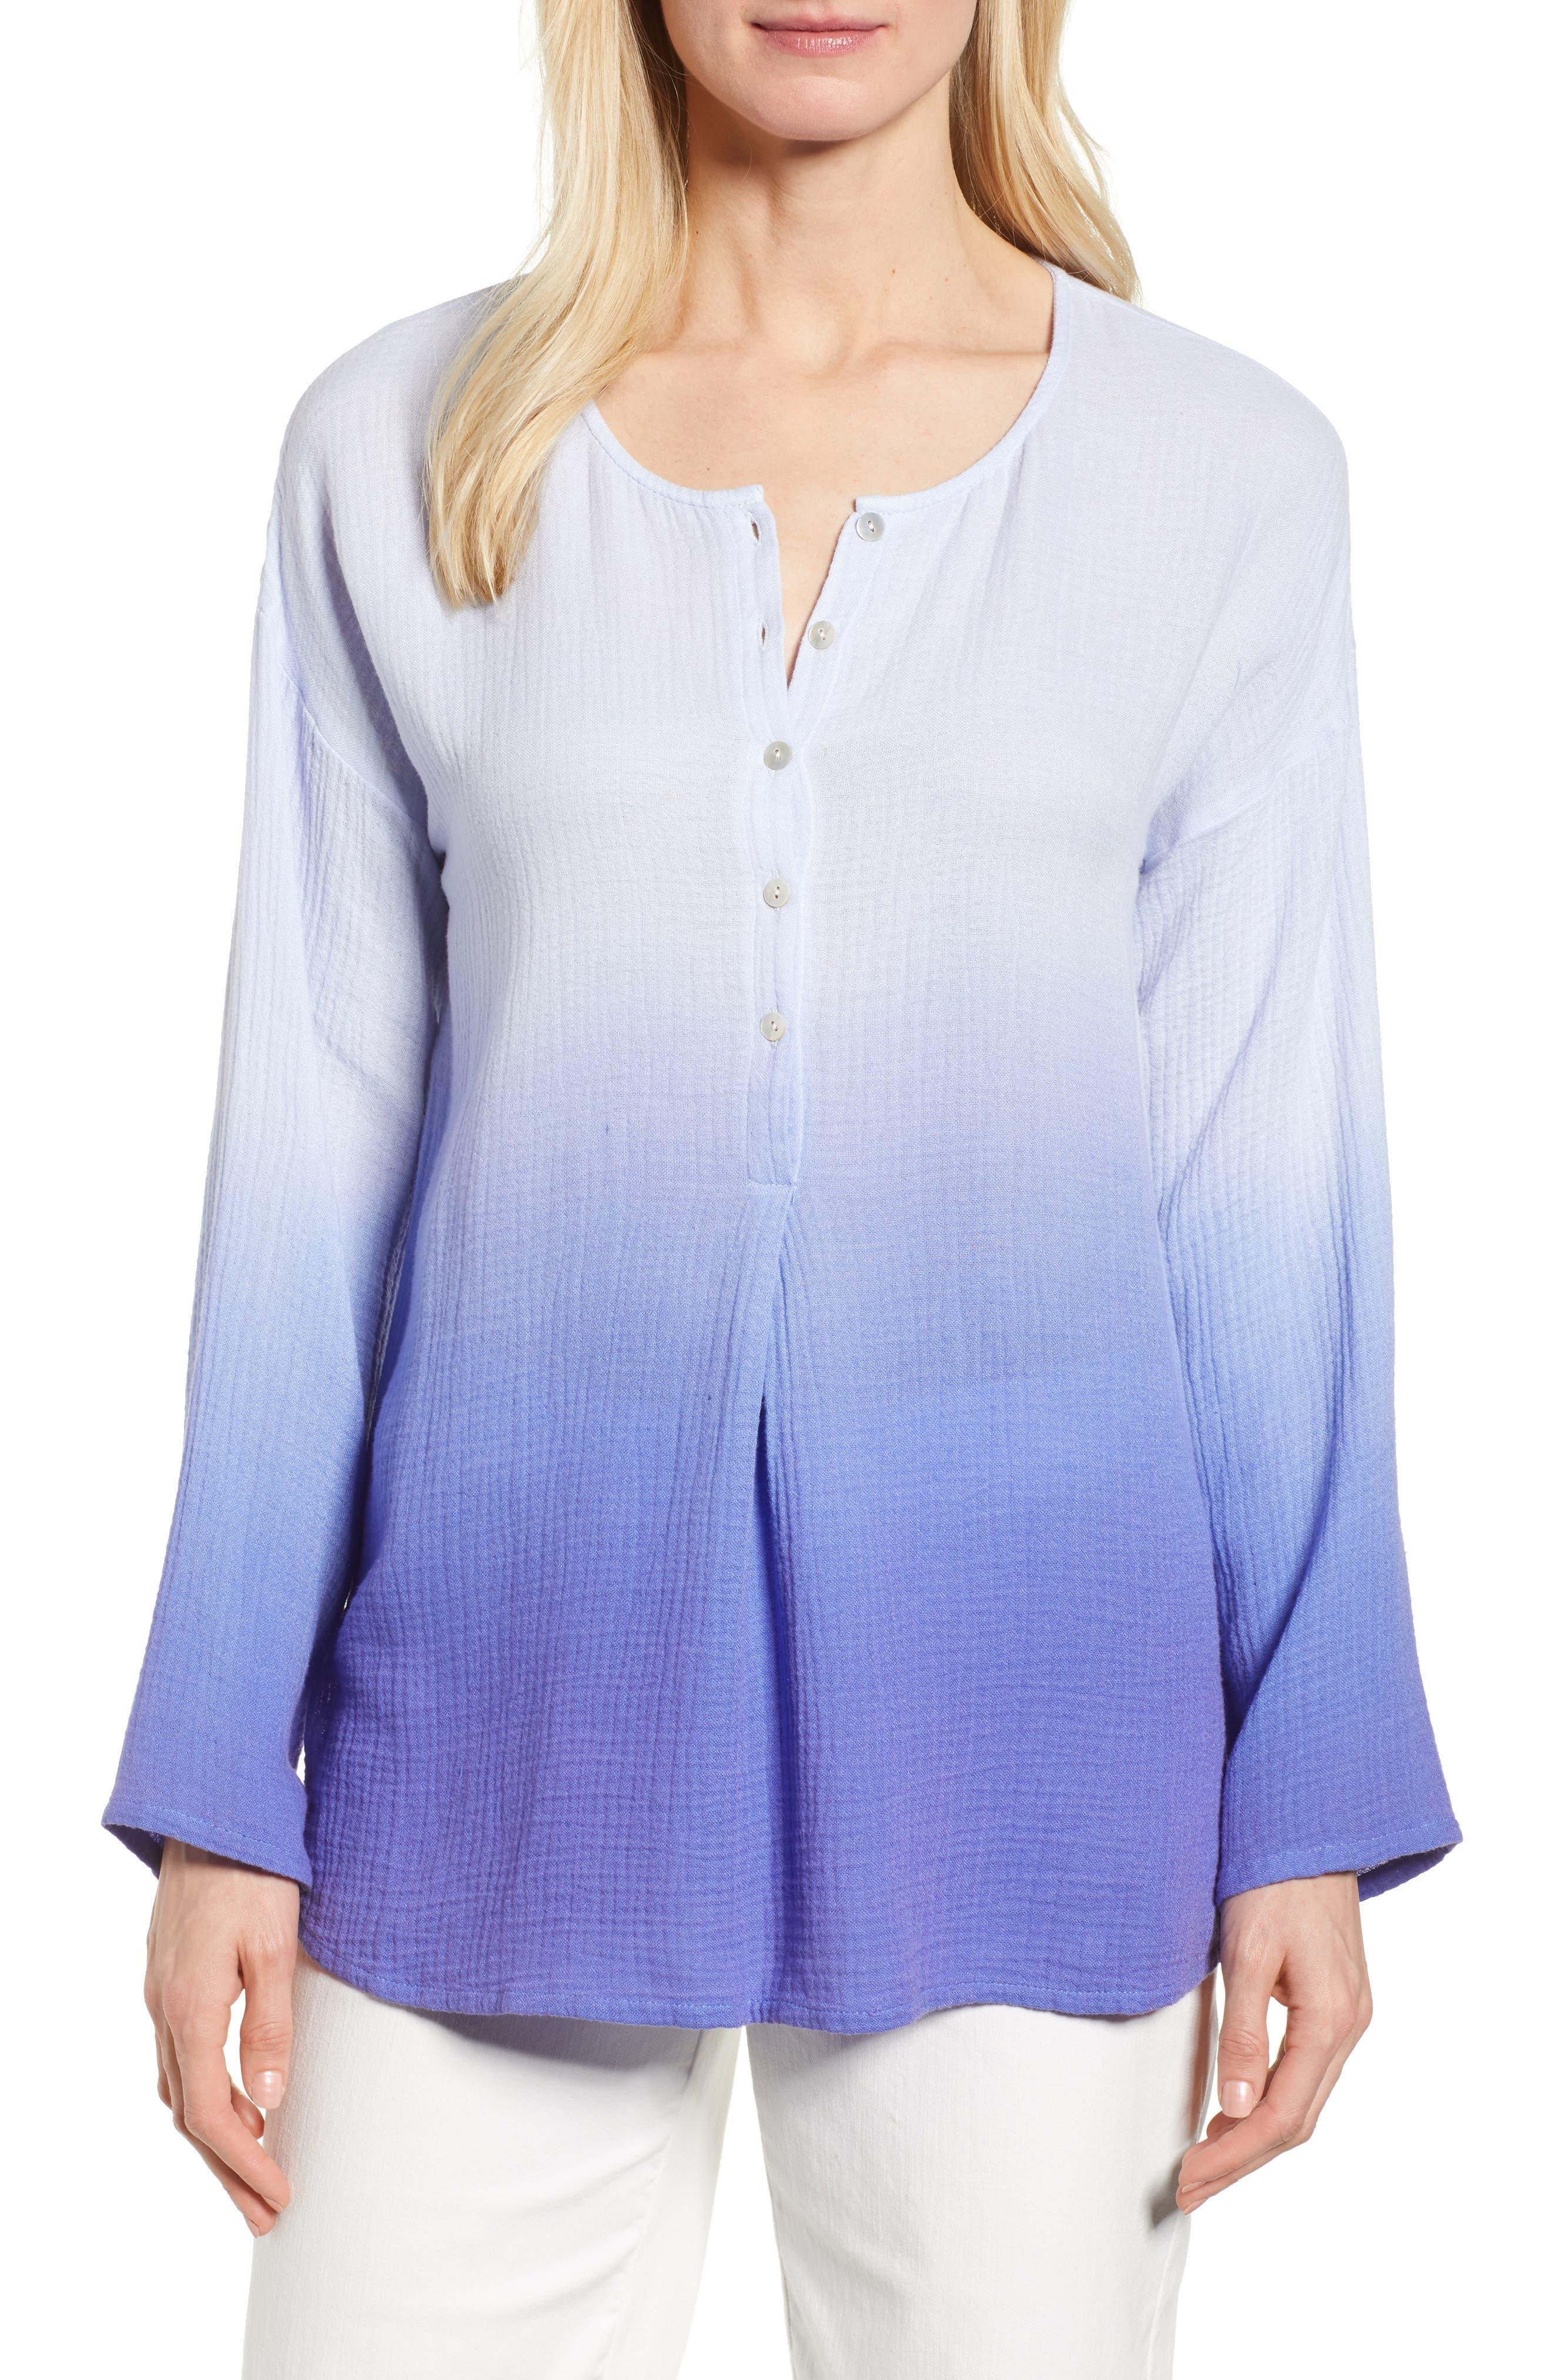 Take Comfort Tunic Top,                         Main,                         color, Ultramarine